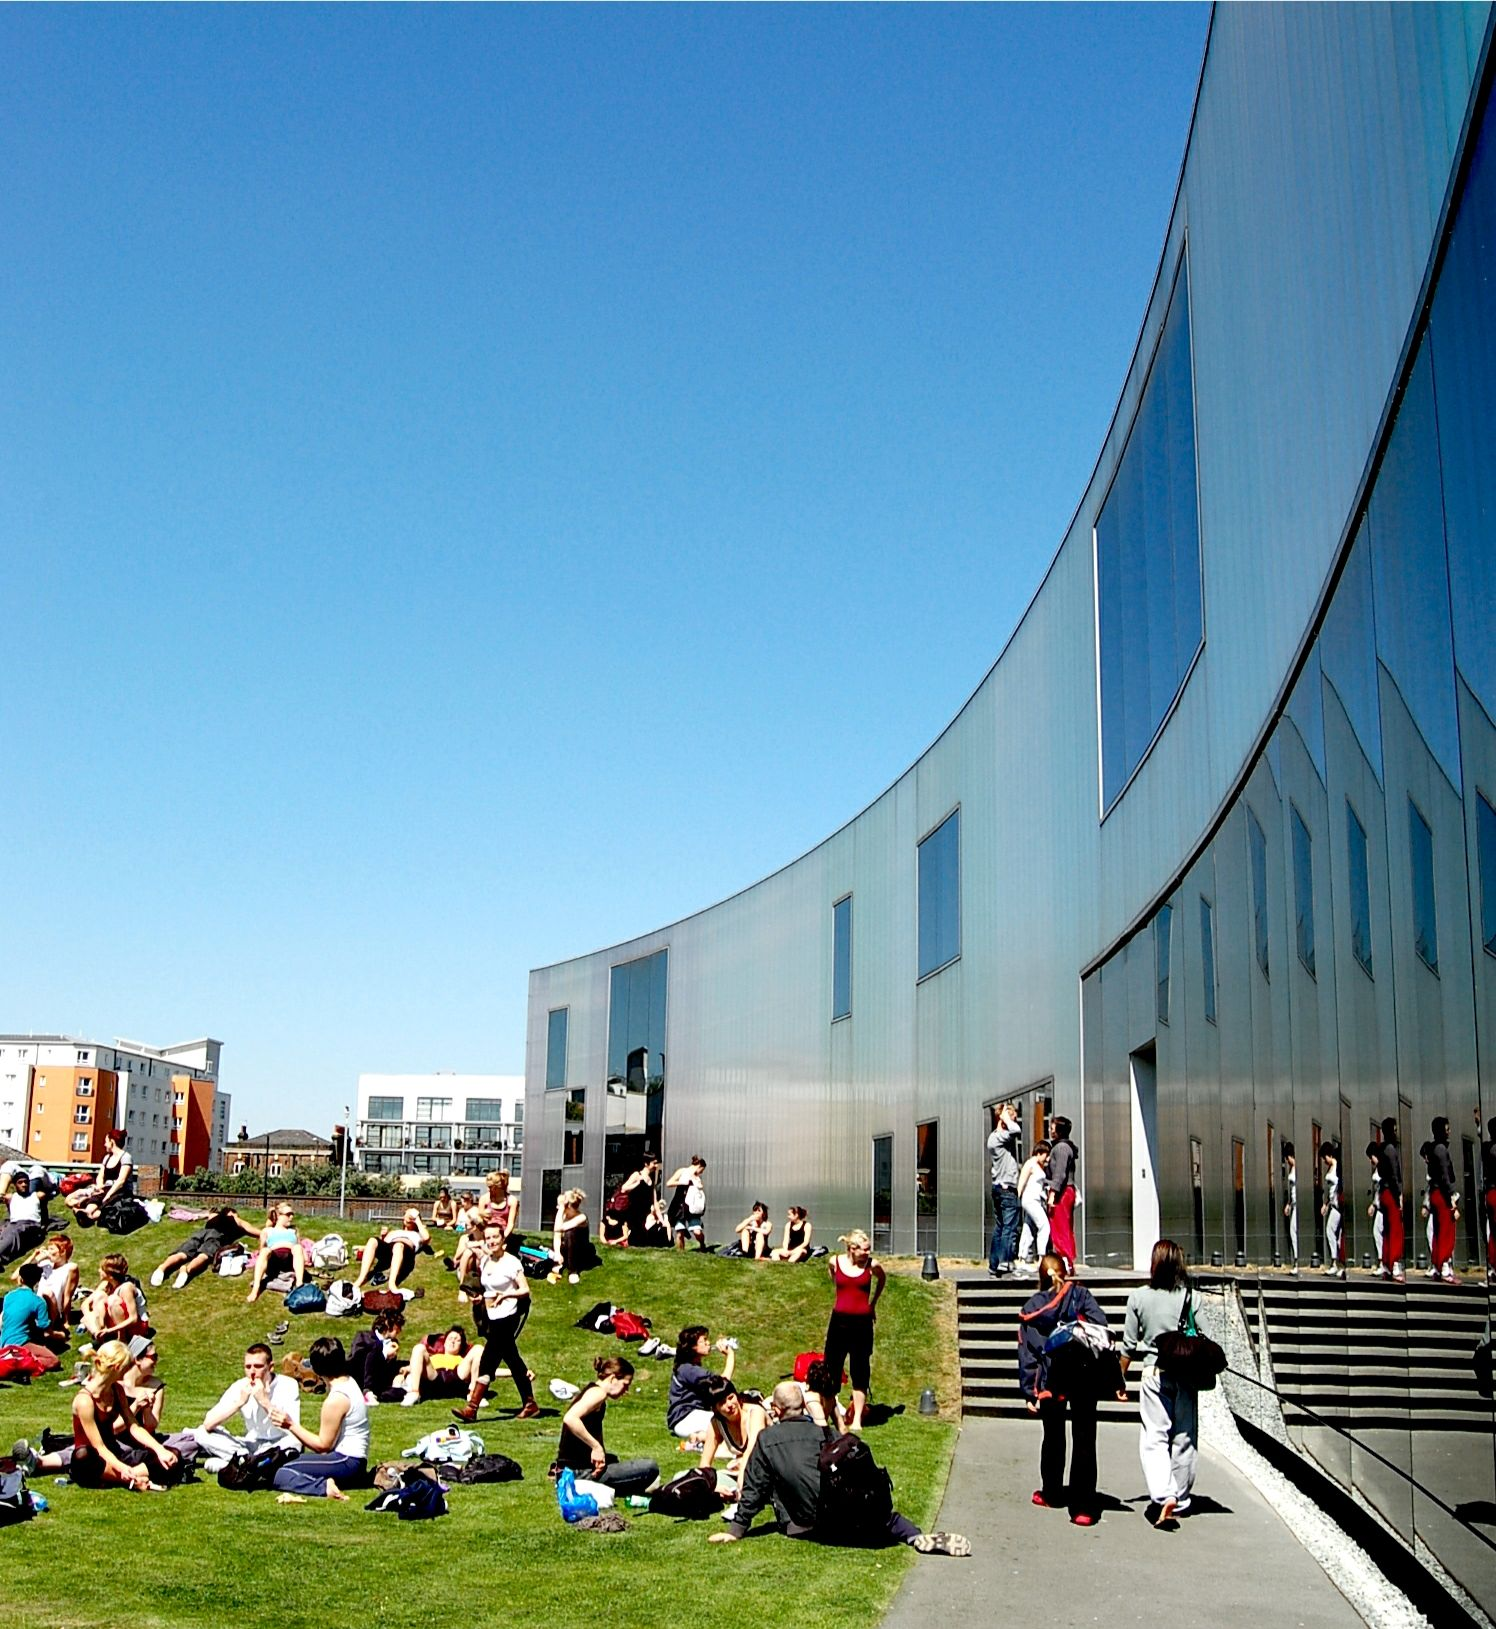 Centro de danza Laban, Londres, UK. H & de M, Arquitectos